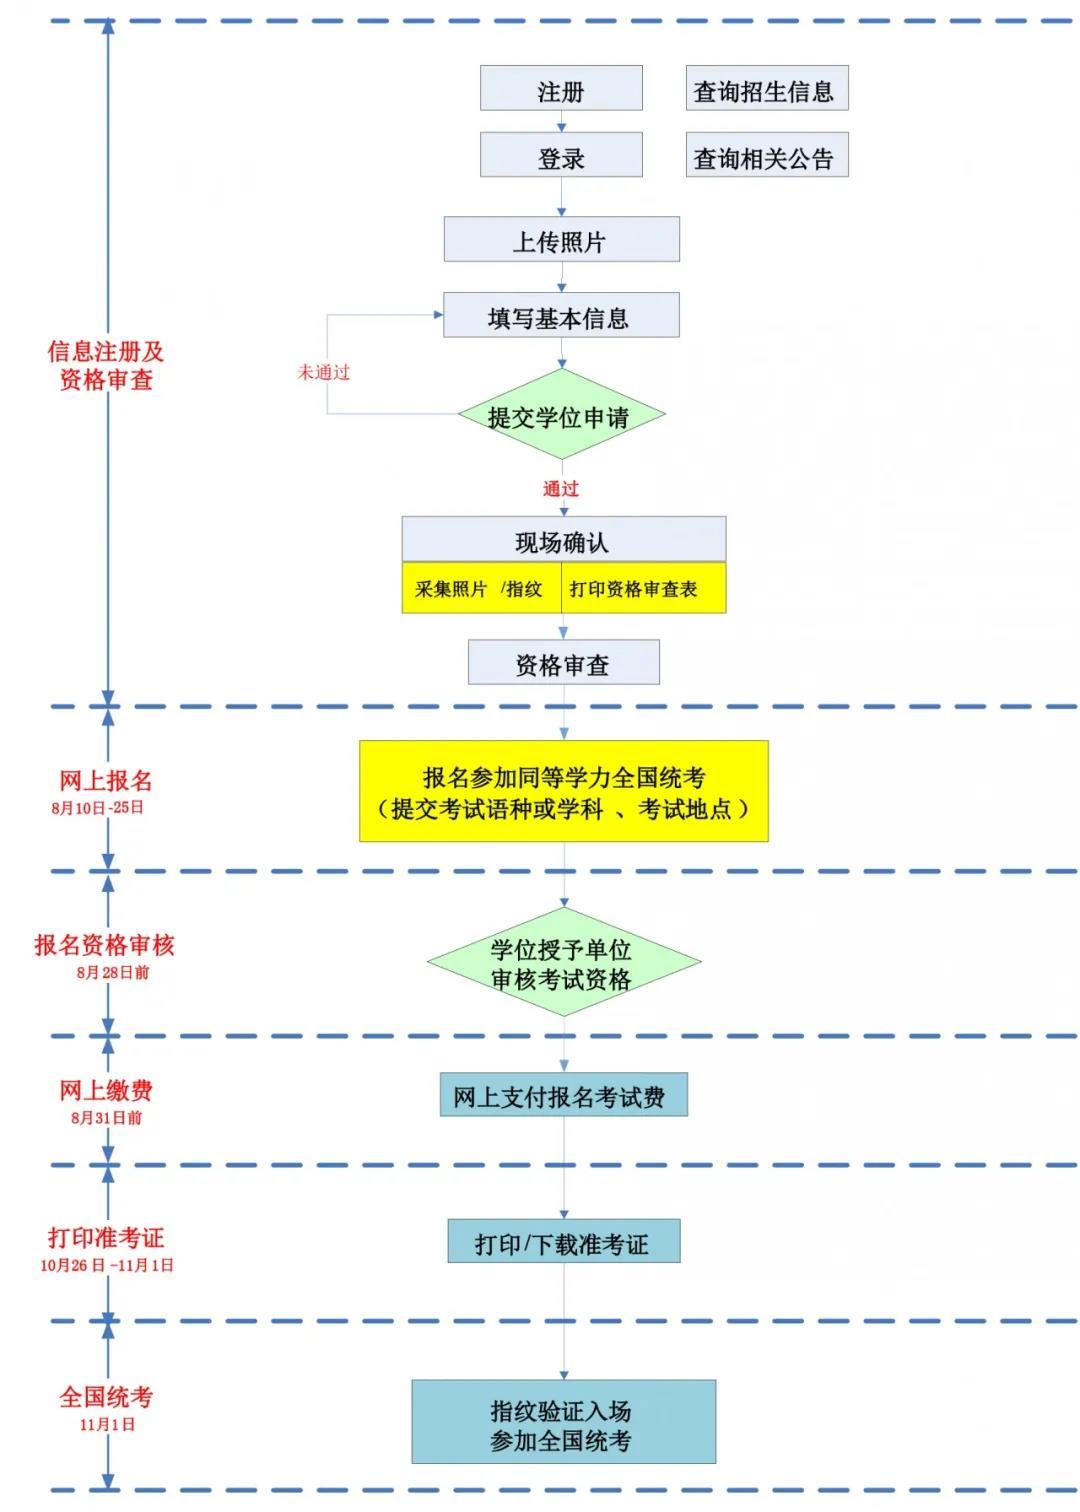 https://resources.cepsp.com.cn/uploads/2020/10/21/b881102d2ea8a6a04a7609a69a7d2978.jpg